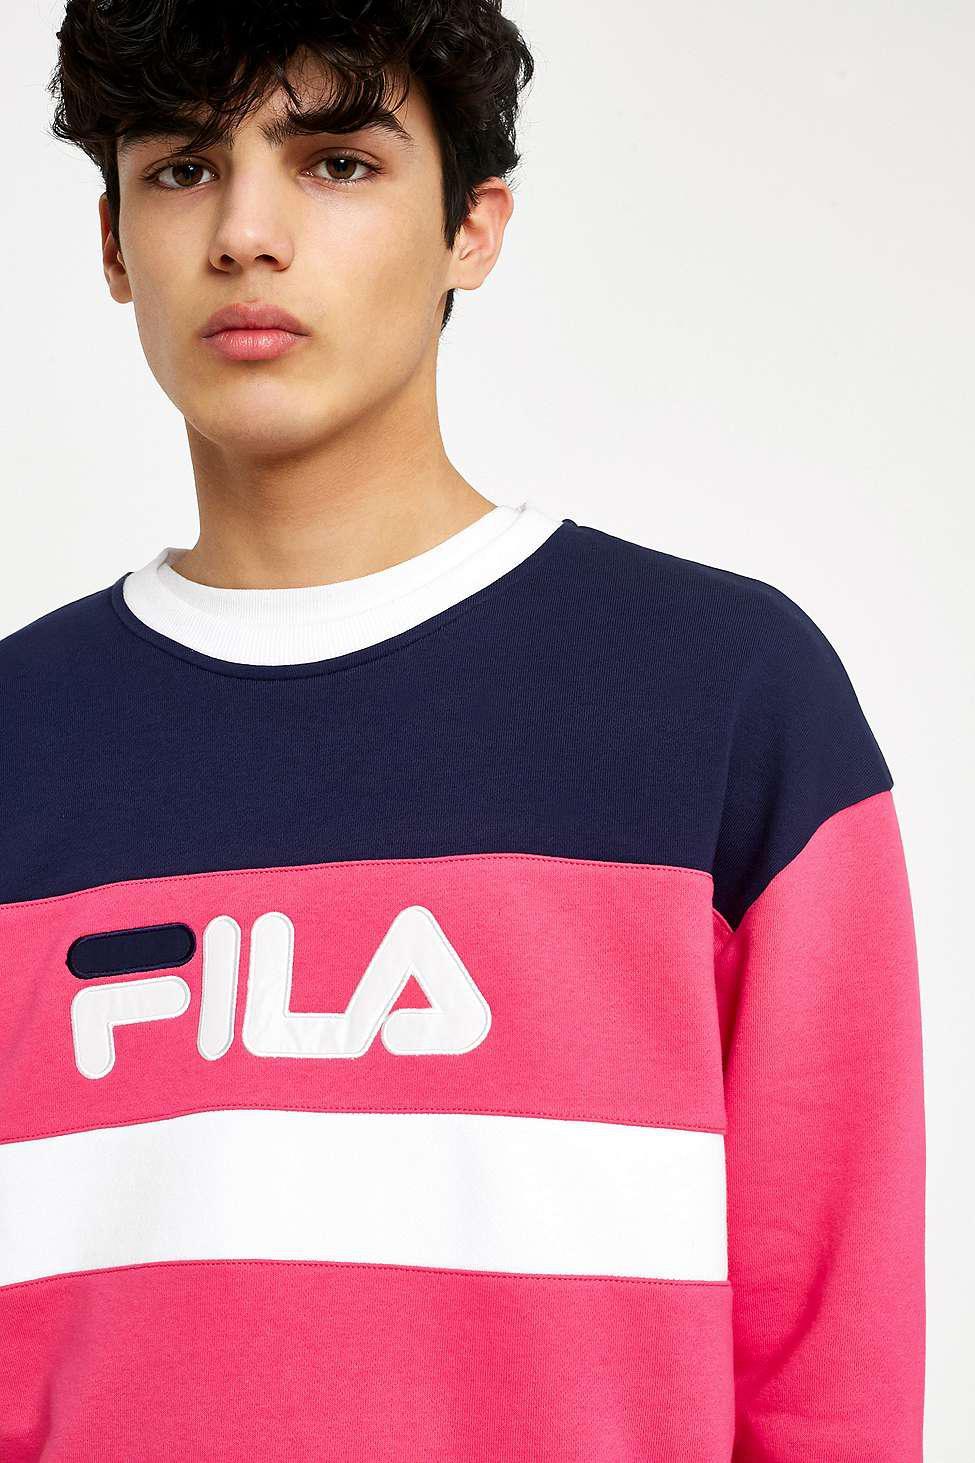 6e9b37015a61 Fila Jupiter Cut And Sew Sweatshirt - Mens L in Pink for Men - Lyst